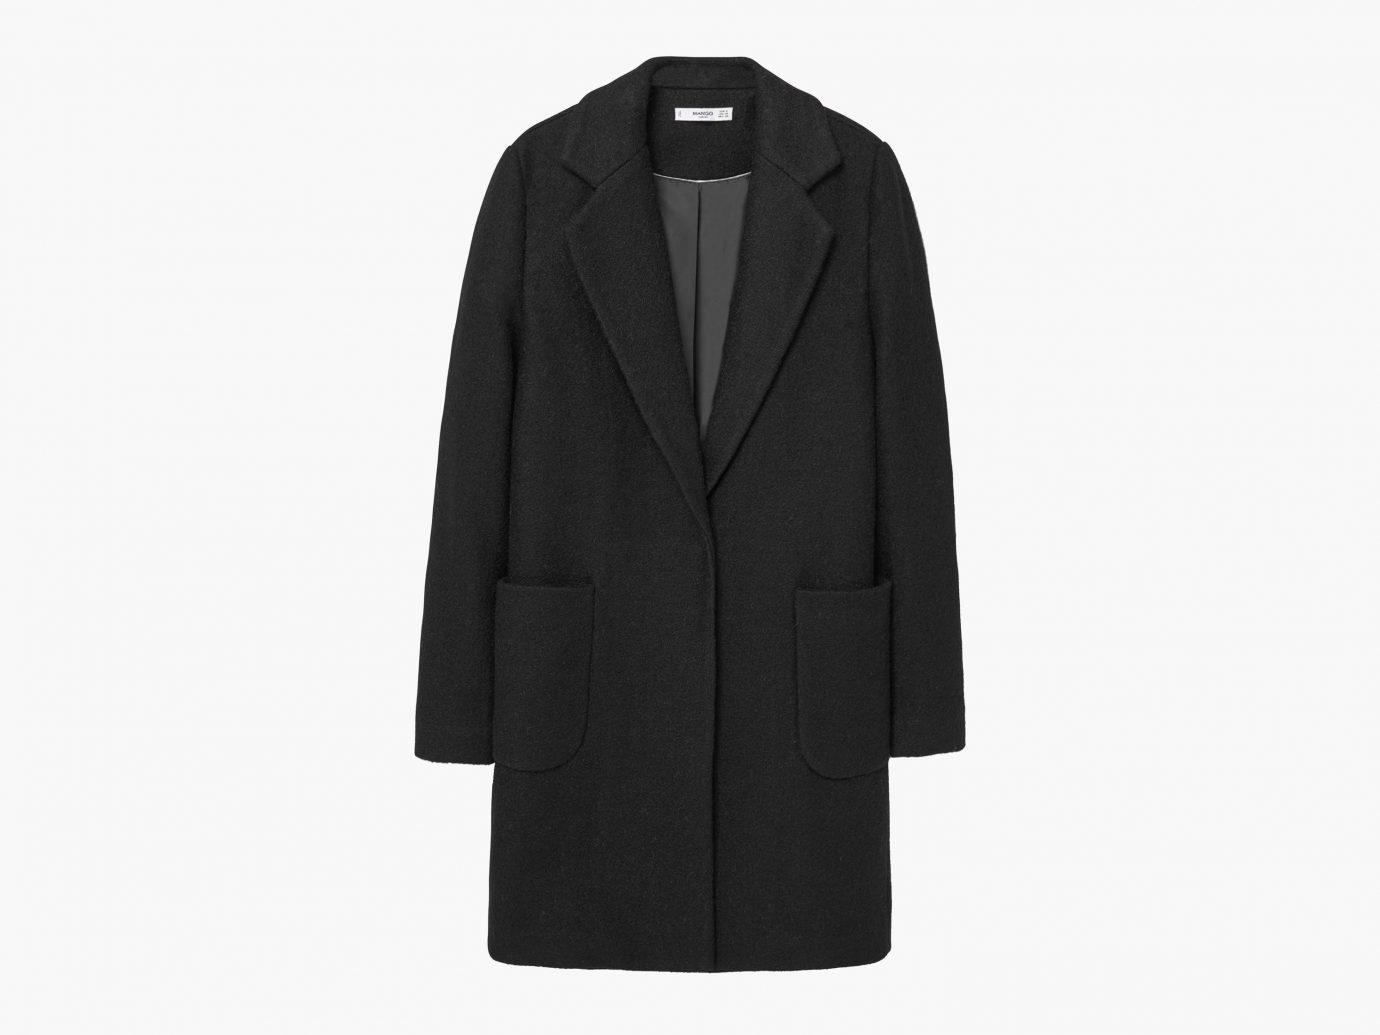 Style + Design suit clothing coat overcoat outerwear wearing jacket wool woolen formal wear textile posing dressed tan